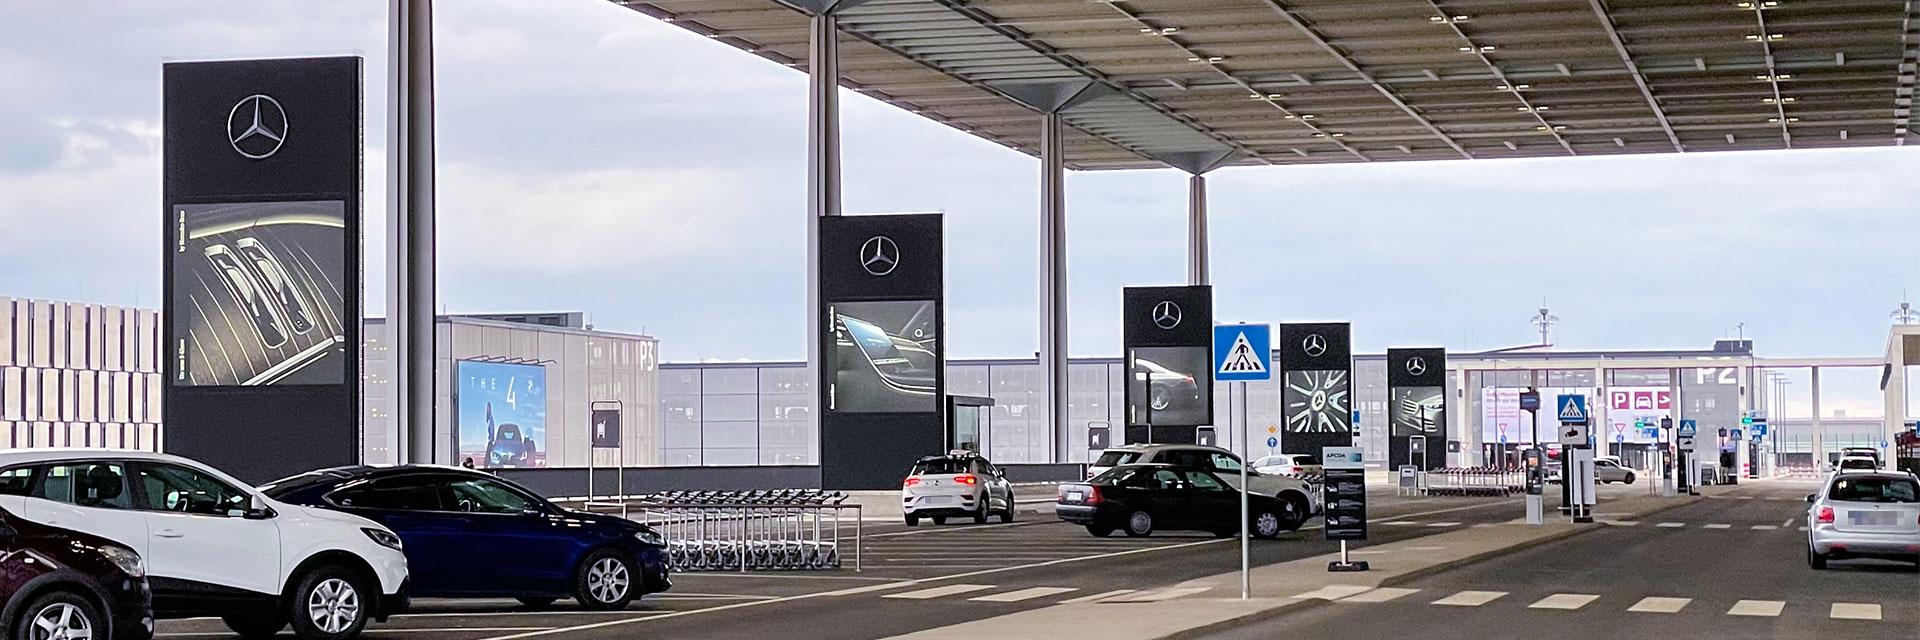 Mega-Light-Vitrinen im Sonderformat direkt am Terminal 1